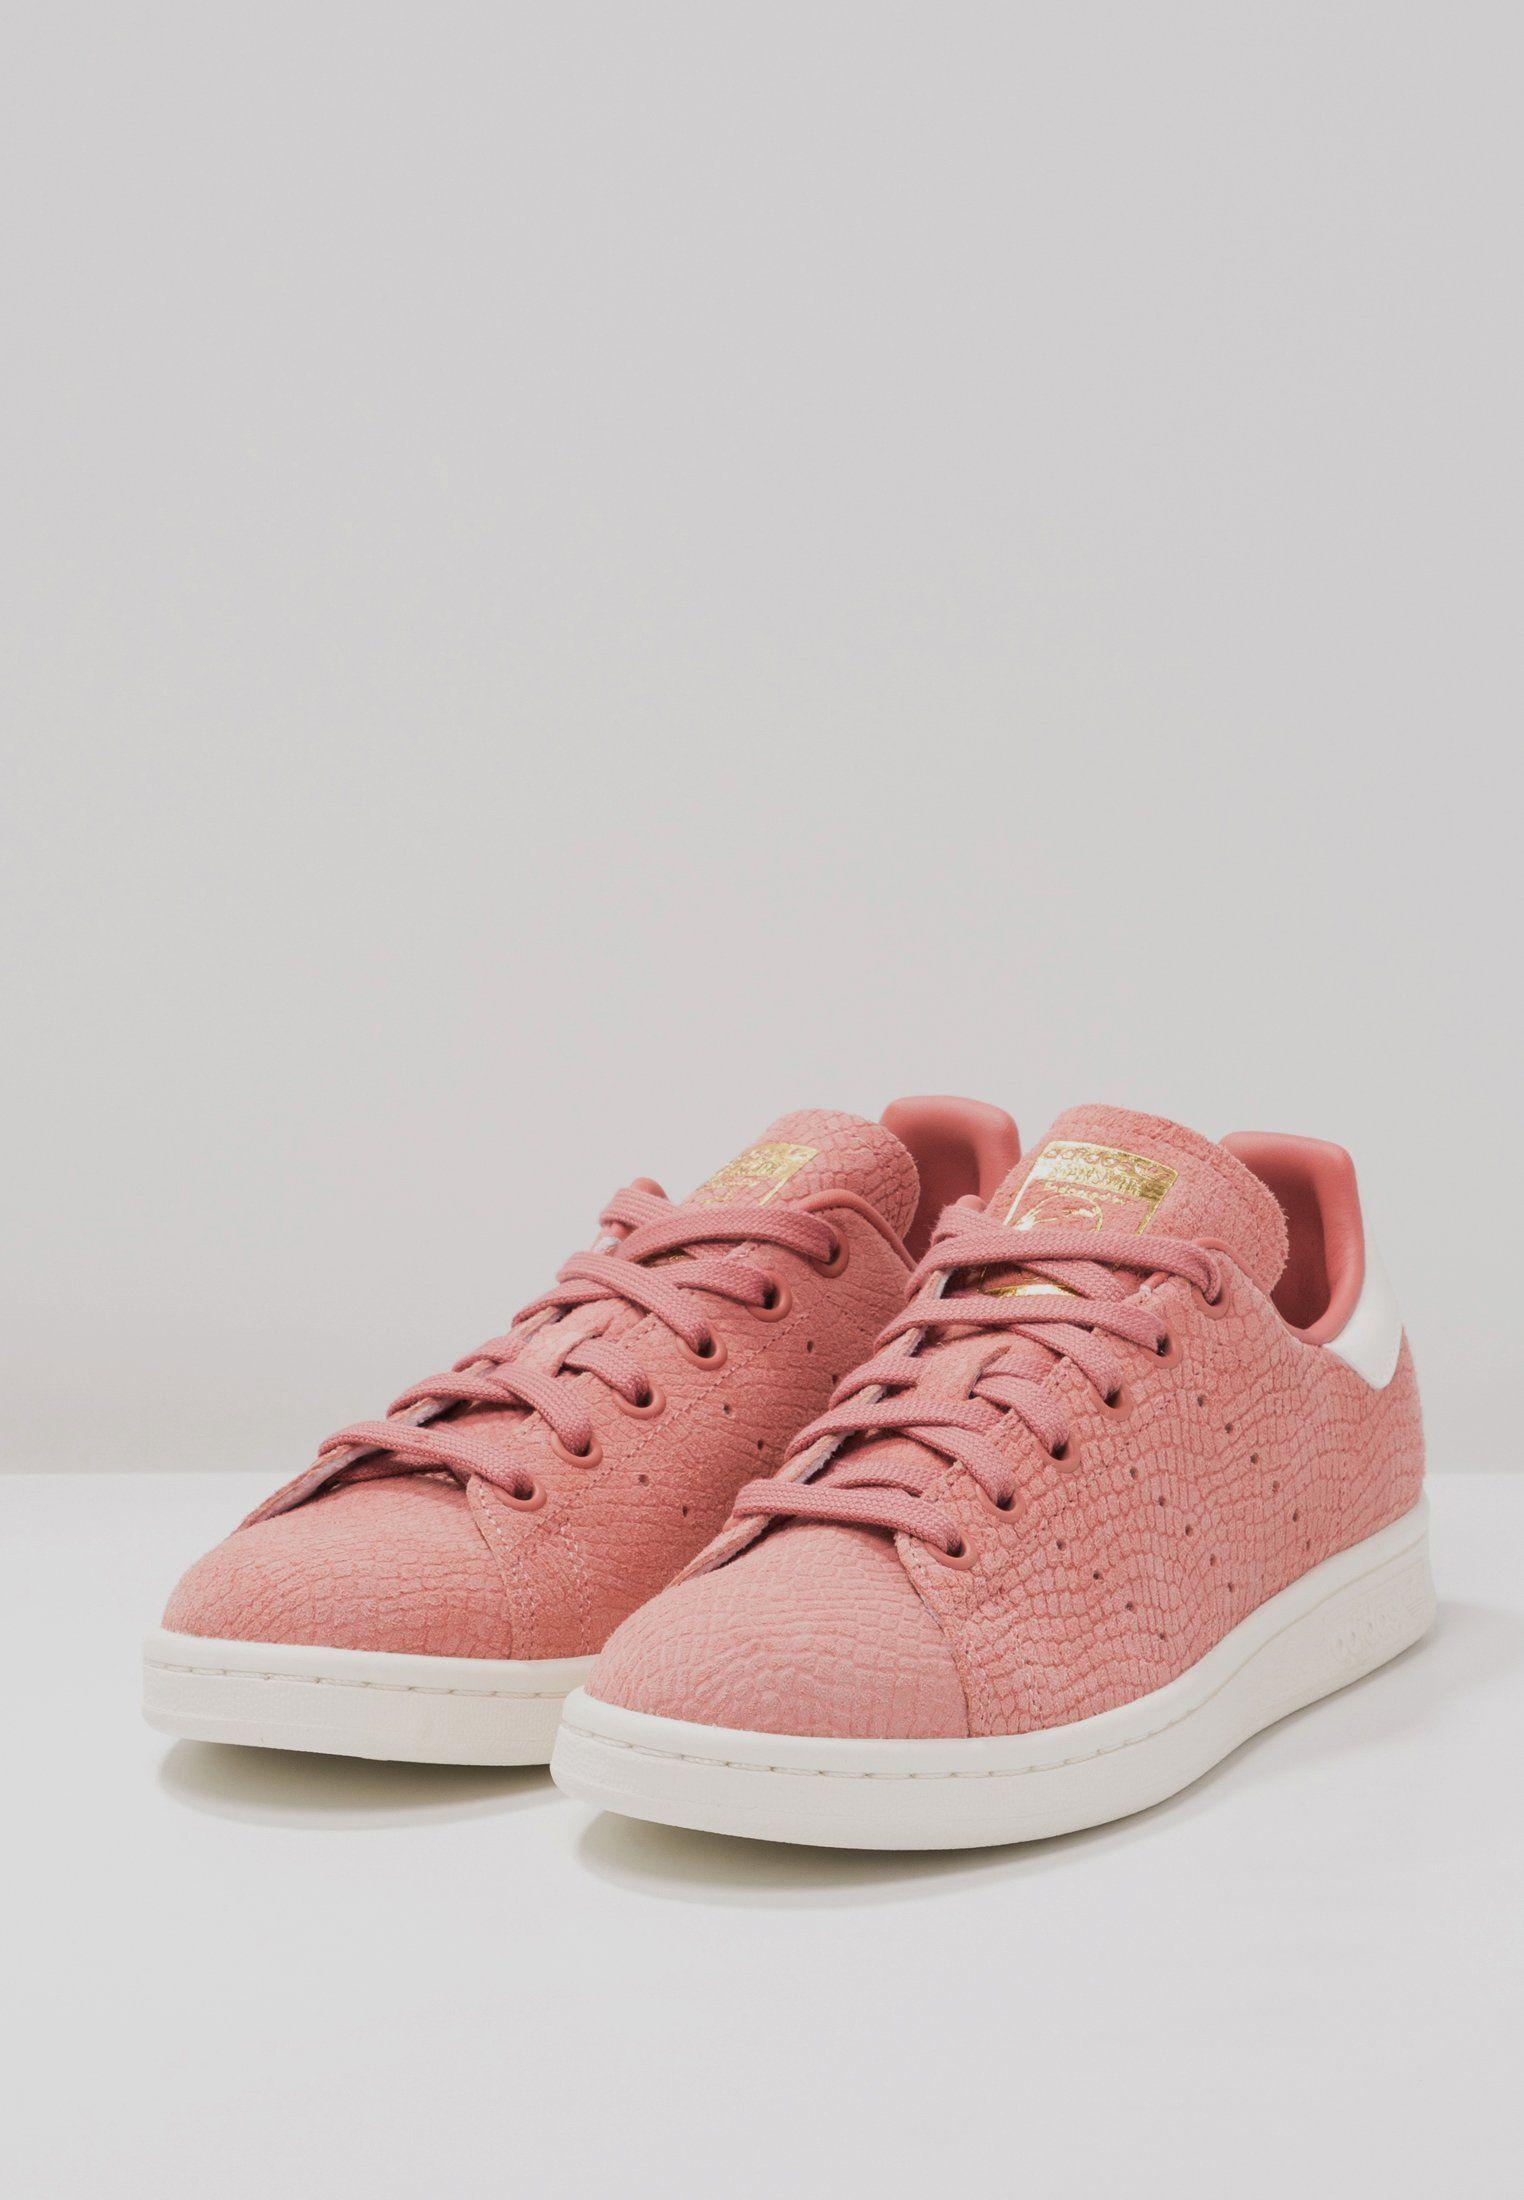 STAN SMITH Sneakers ash pinkoffwhite @ Zalando.dk